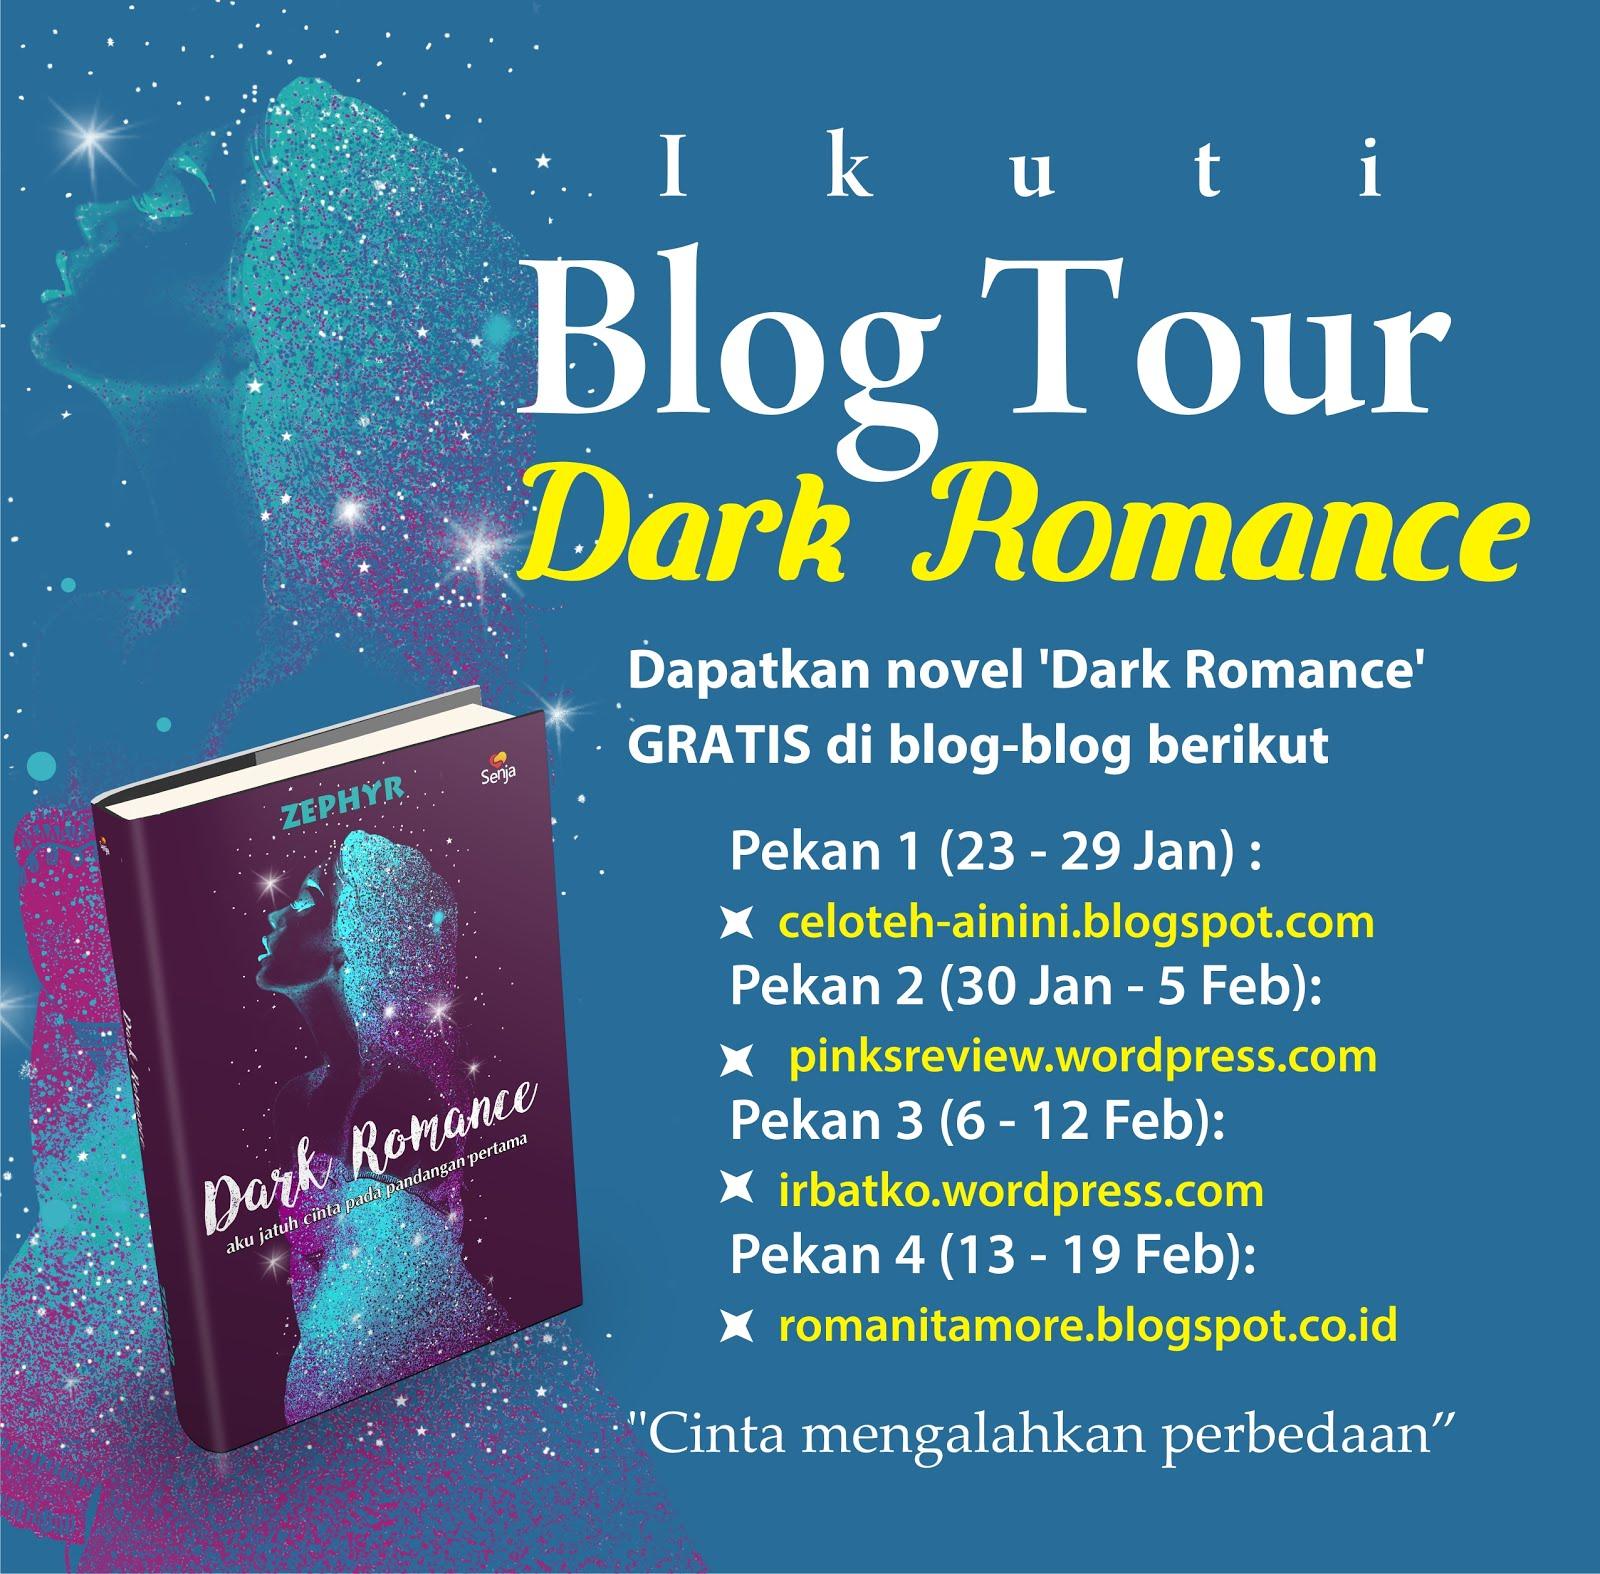 Blogtour & Giveaway #DarkRomance